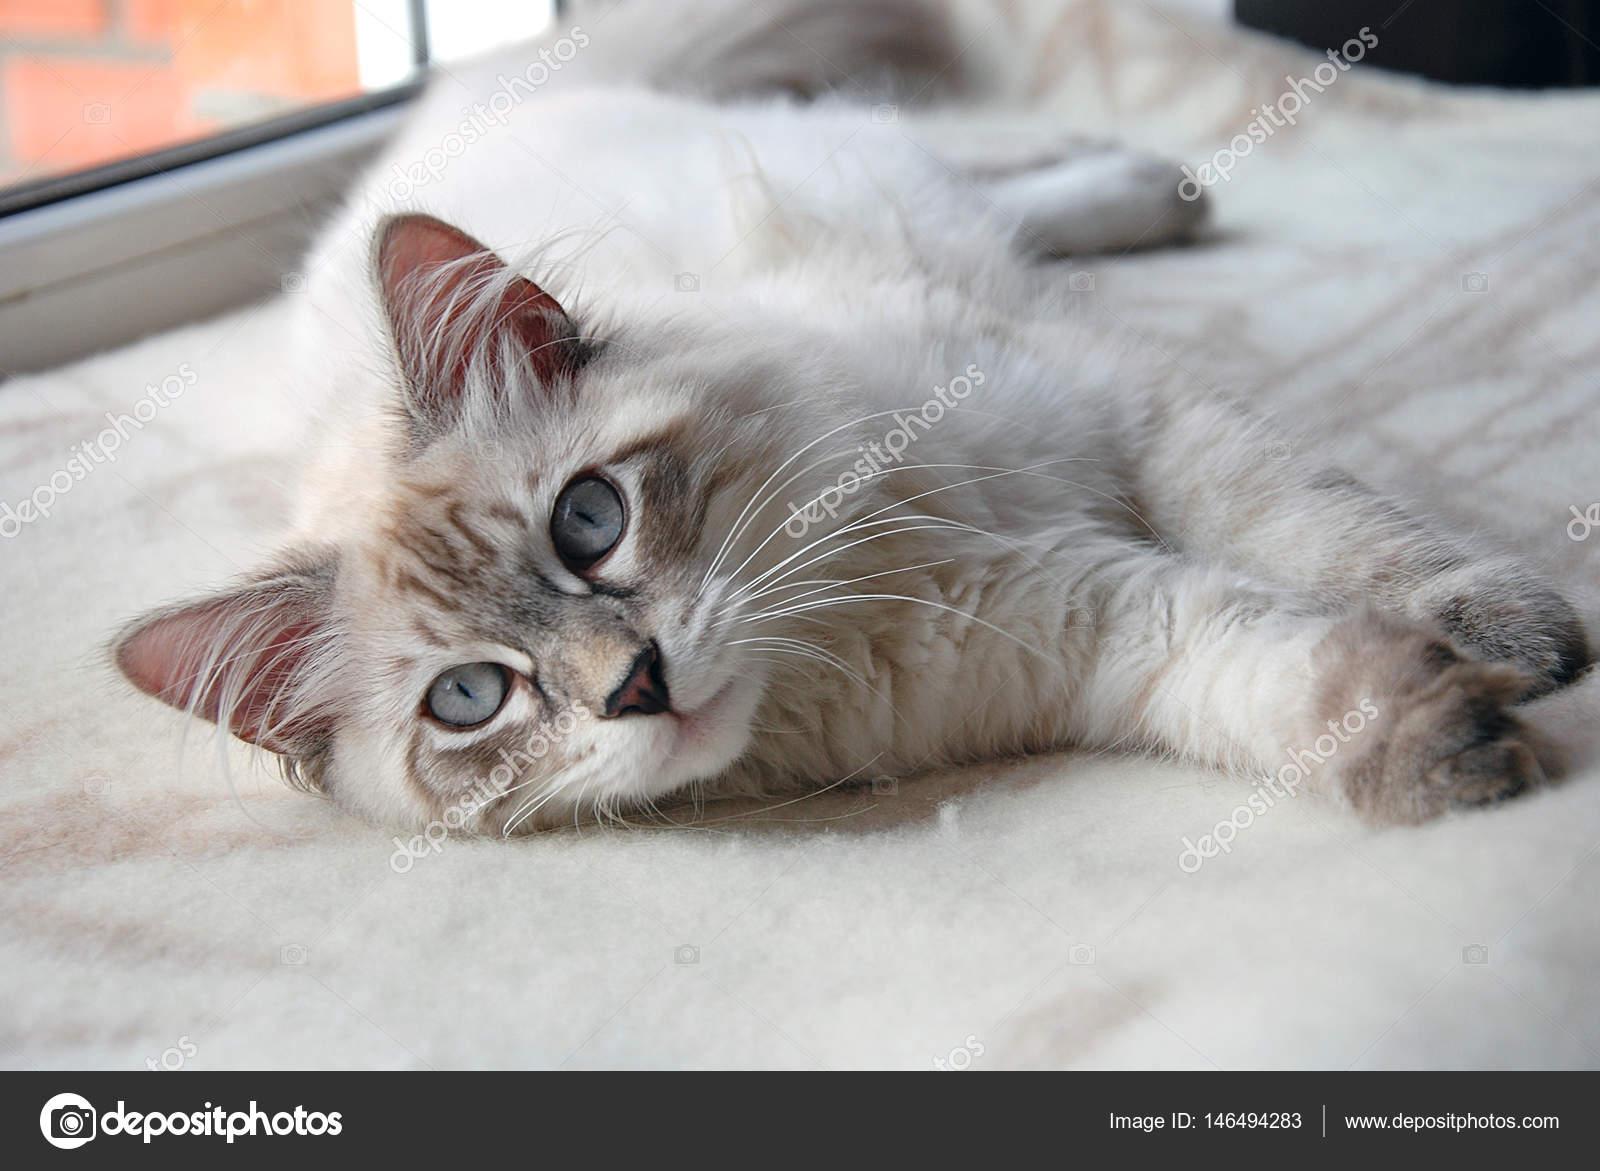 6a263be276c8 Παρόμοιες royalty-free εικόνες  Γάτες Υπέροχη Αφράτη Φωτογραφία Αρχείου